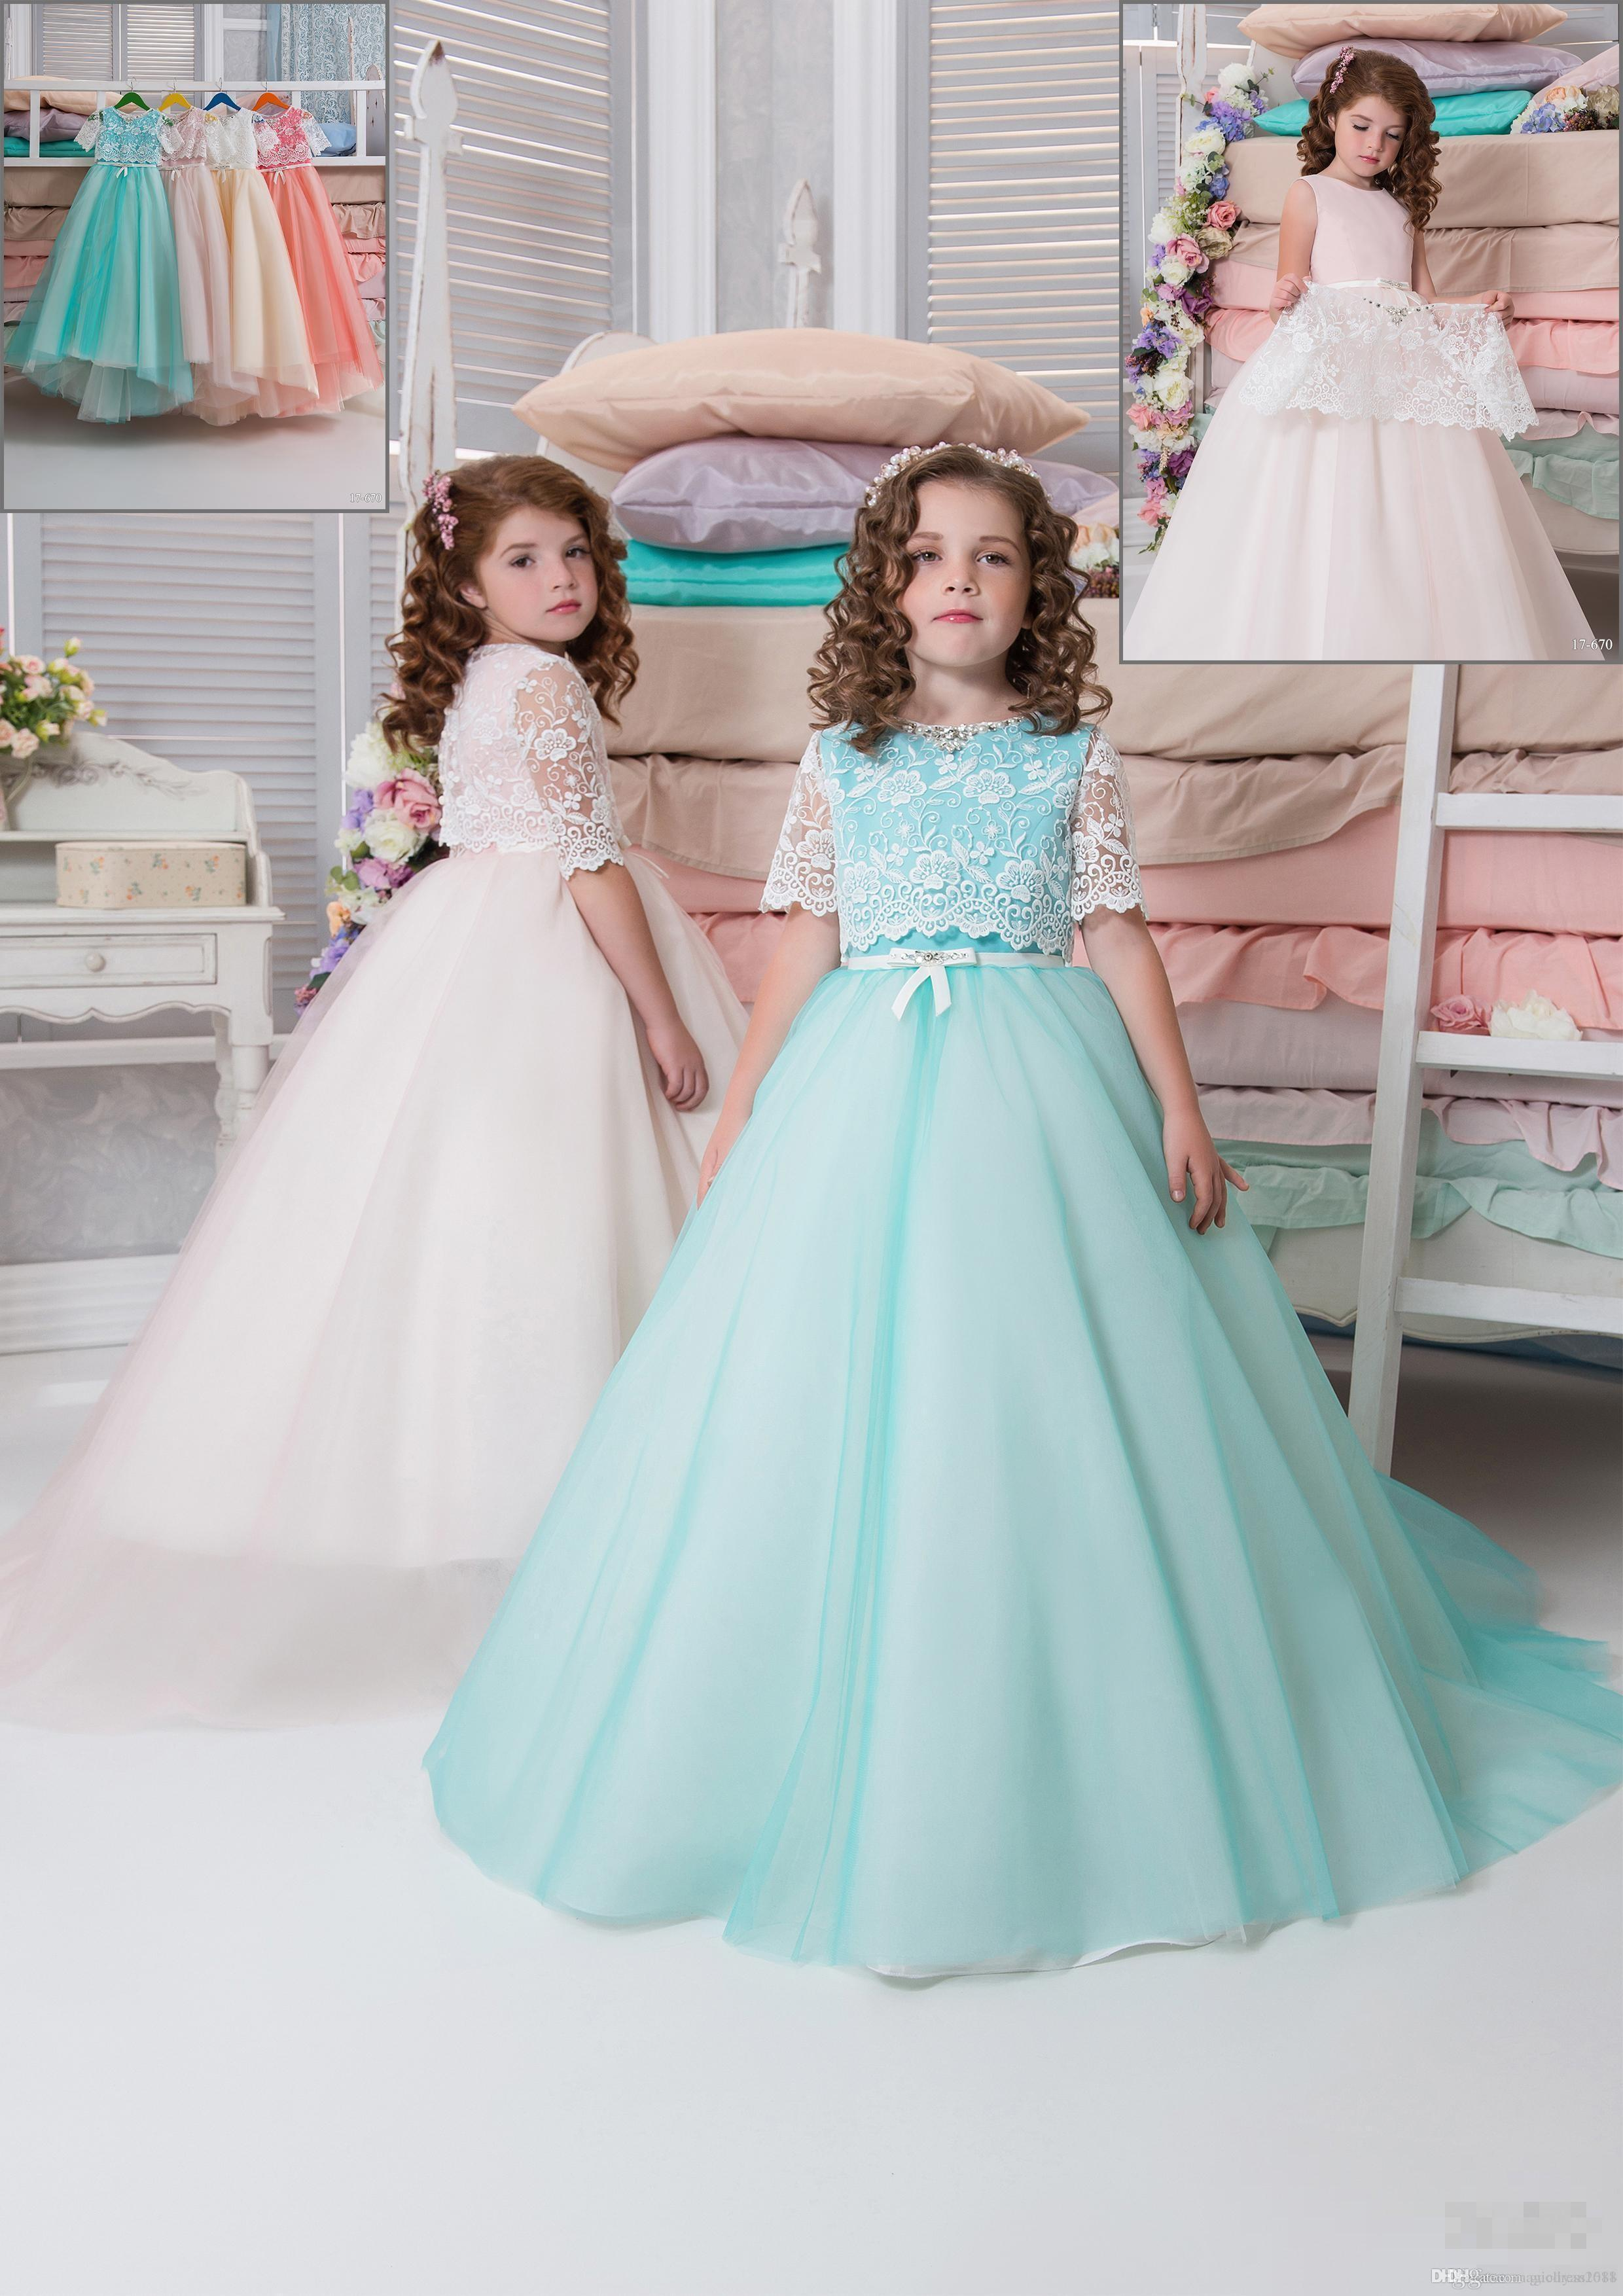 Dos piezas de vestidos de niña de flores de encaje 2019 árabe Vestidos de niño de época Vestidos de novia hermosos de niña de flores baratos